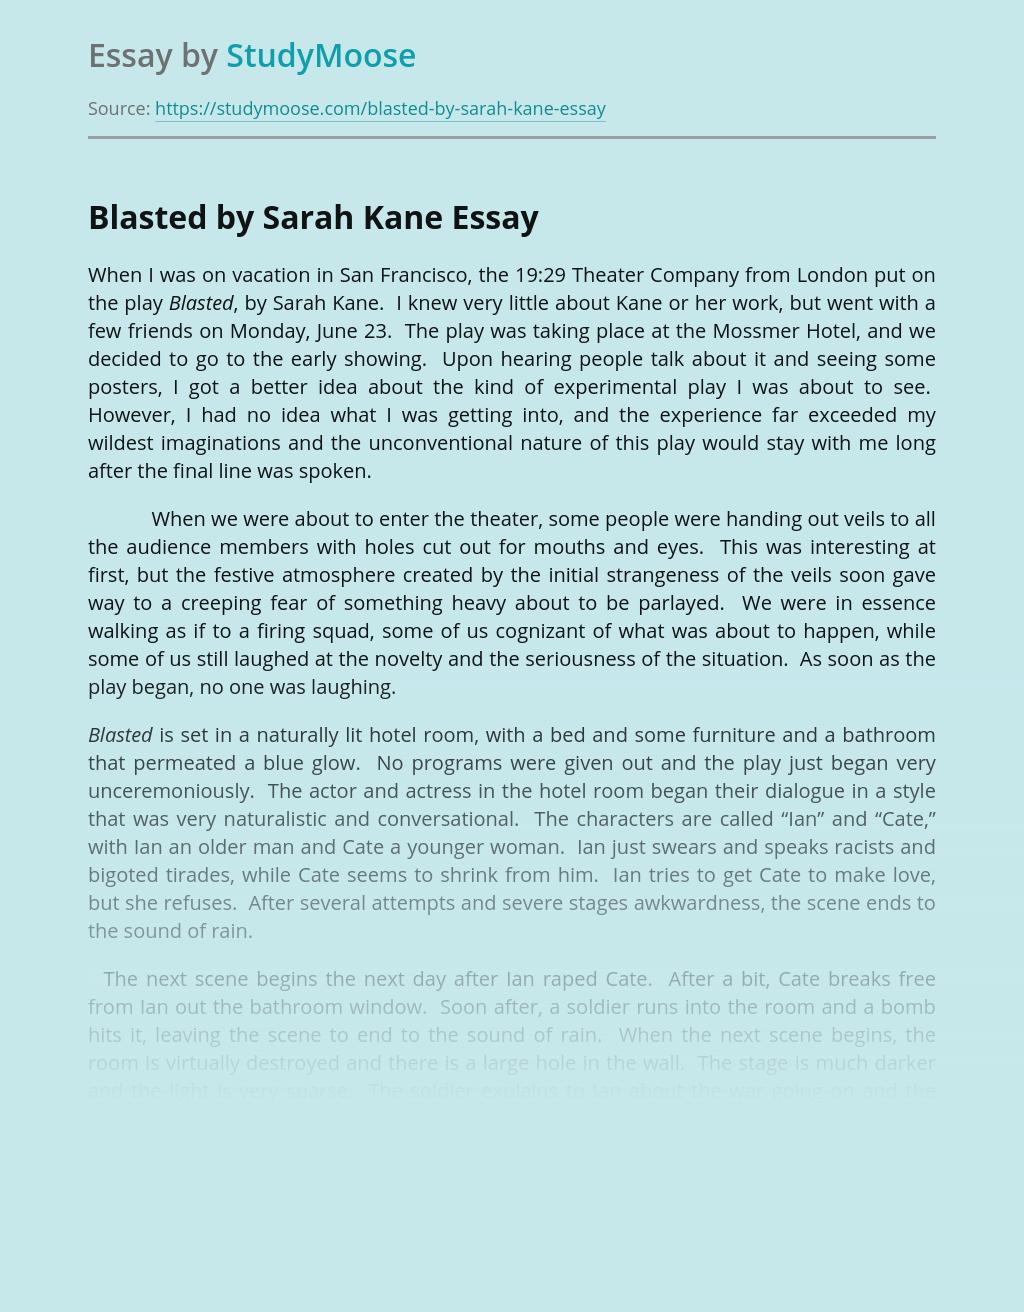 Blasted by Sarah Kane